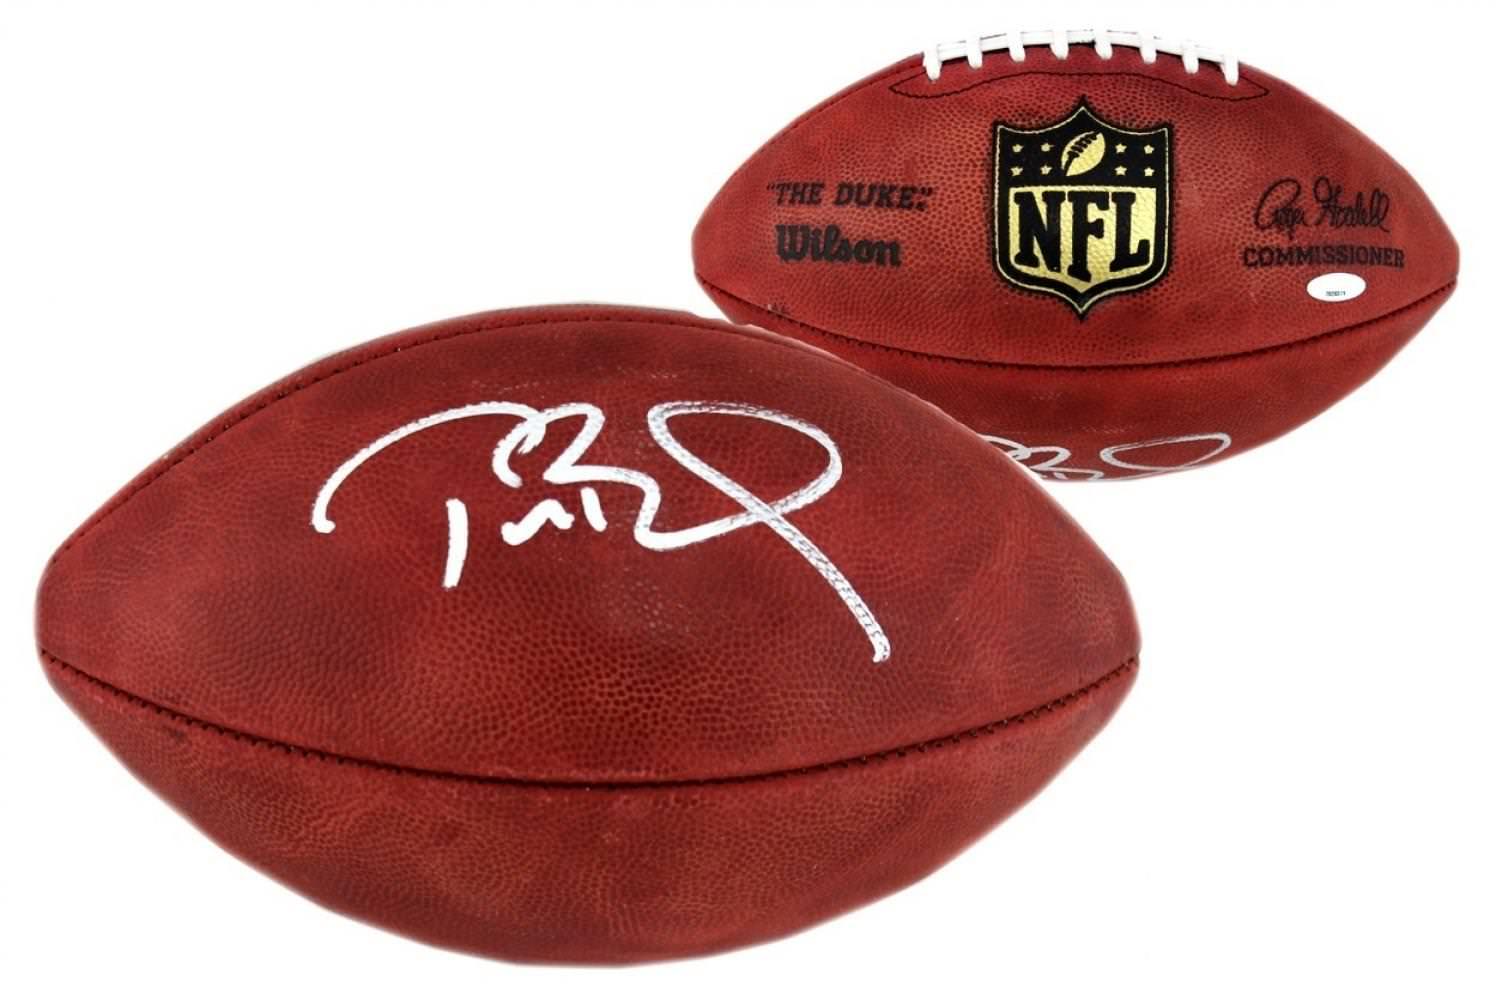 Tom Brady Duke football